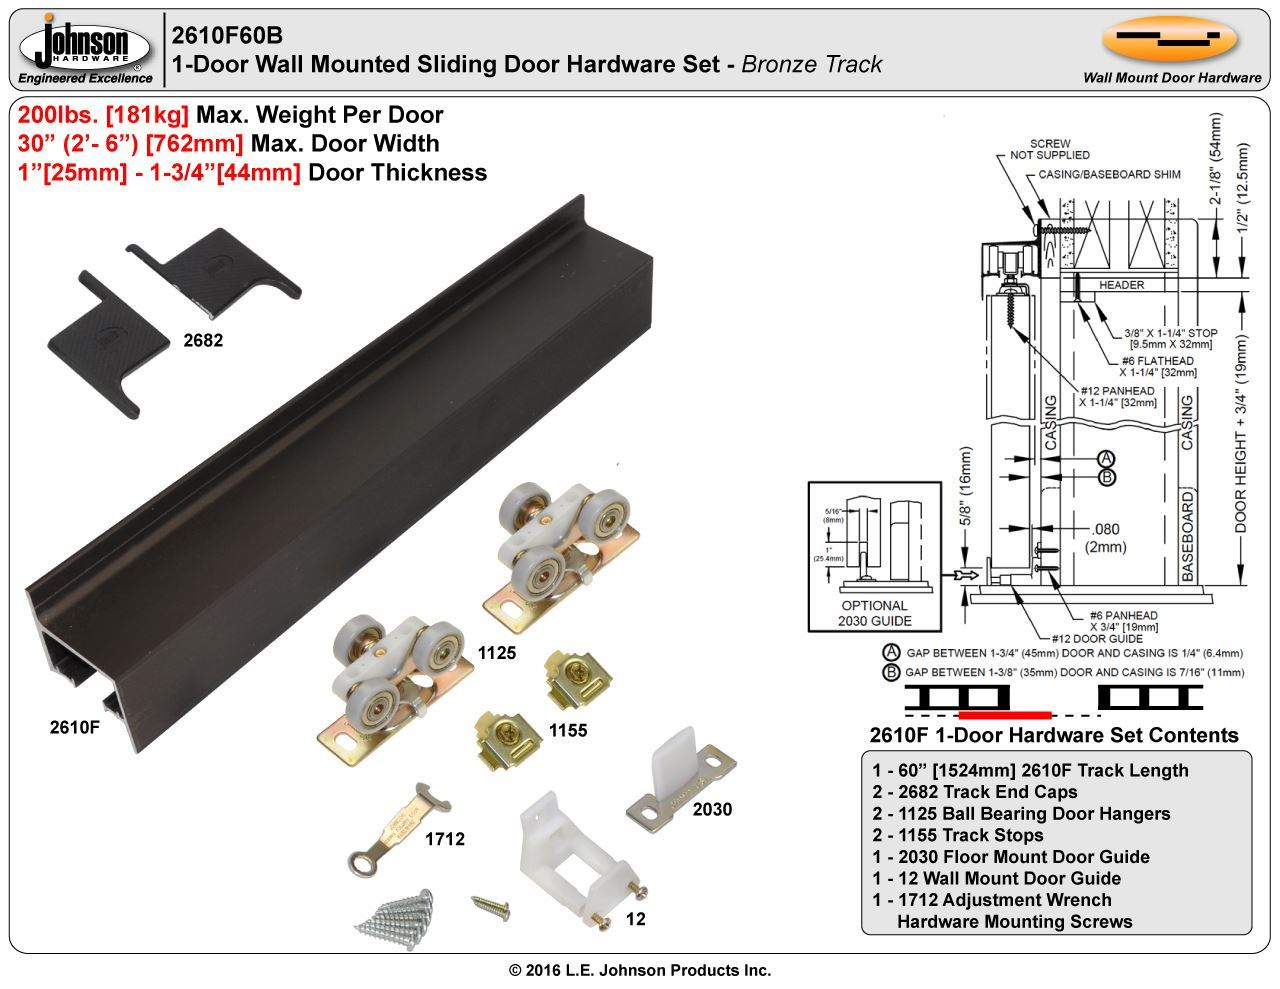 Johnson Hardware 2610f Wall Mount Sliding Door Hardware